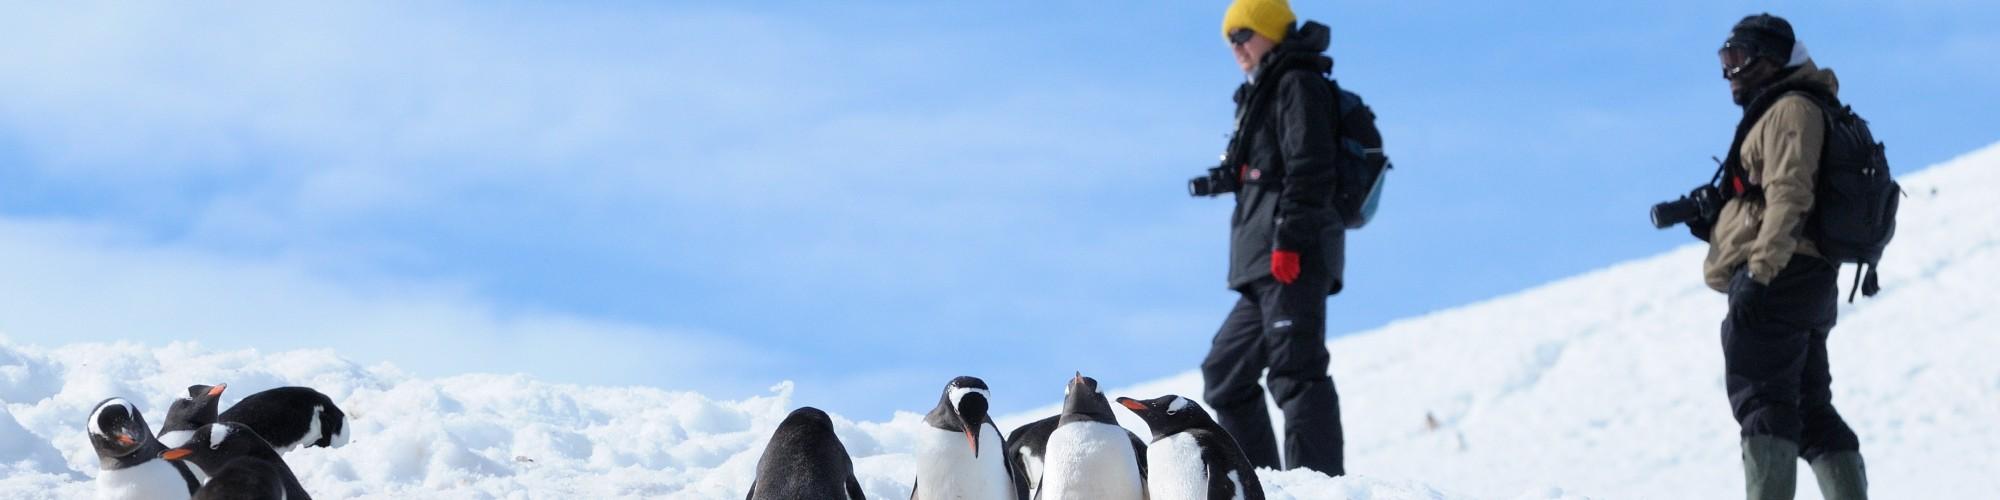 Antarctica December 2010, PLA023, Antarctic Peninsula with South Shetlands, Plancius: Danco Island